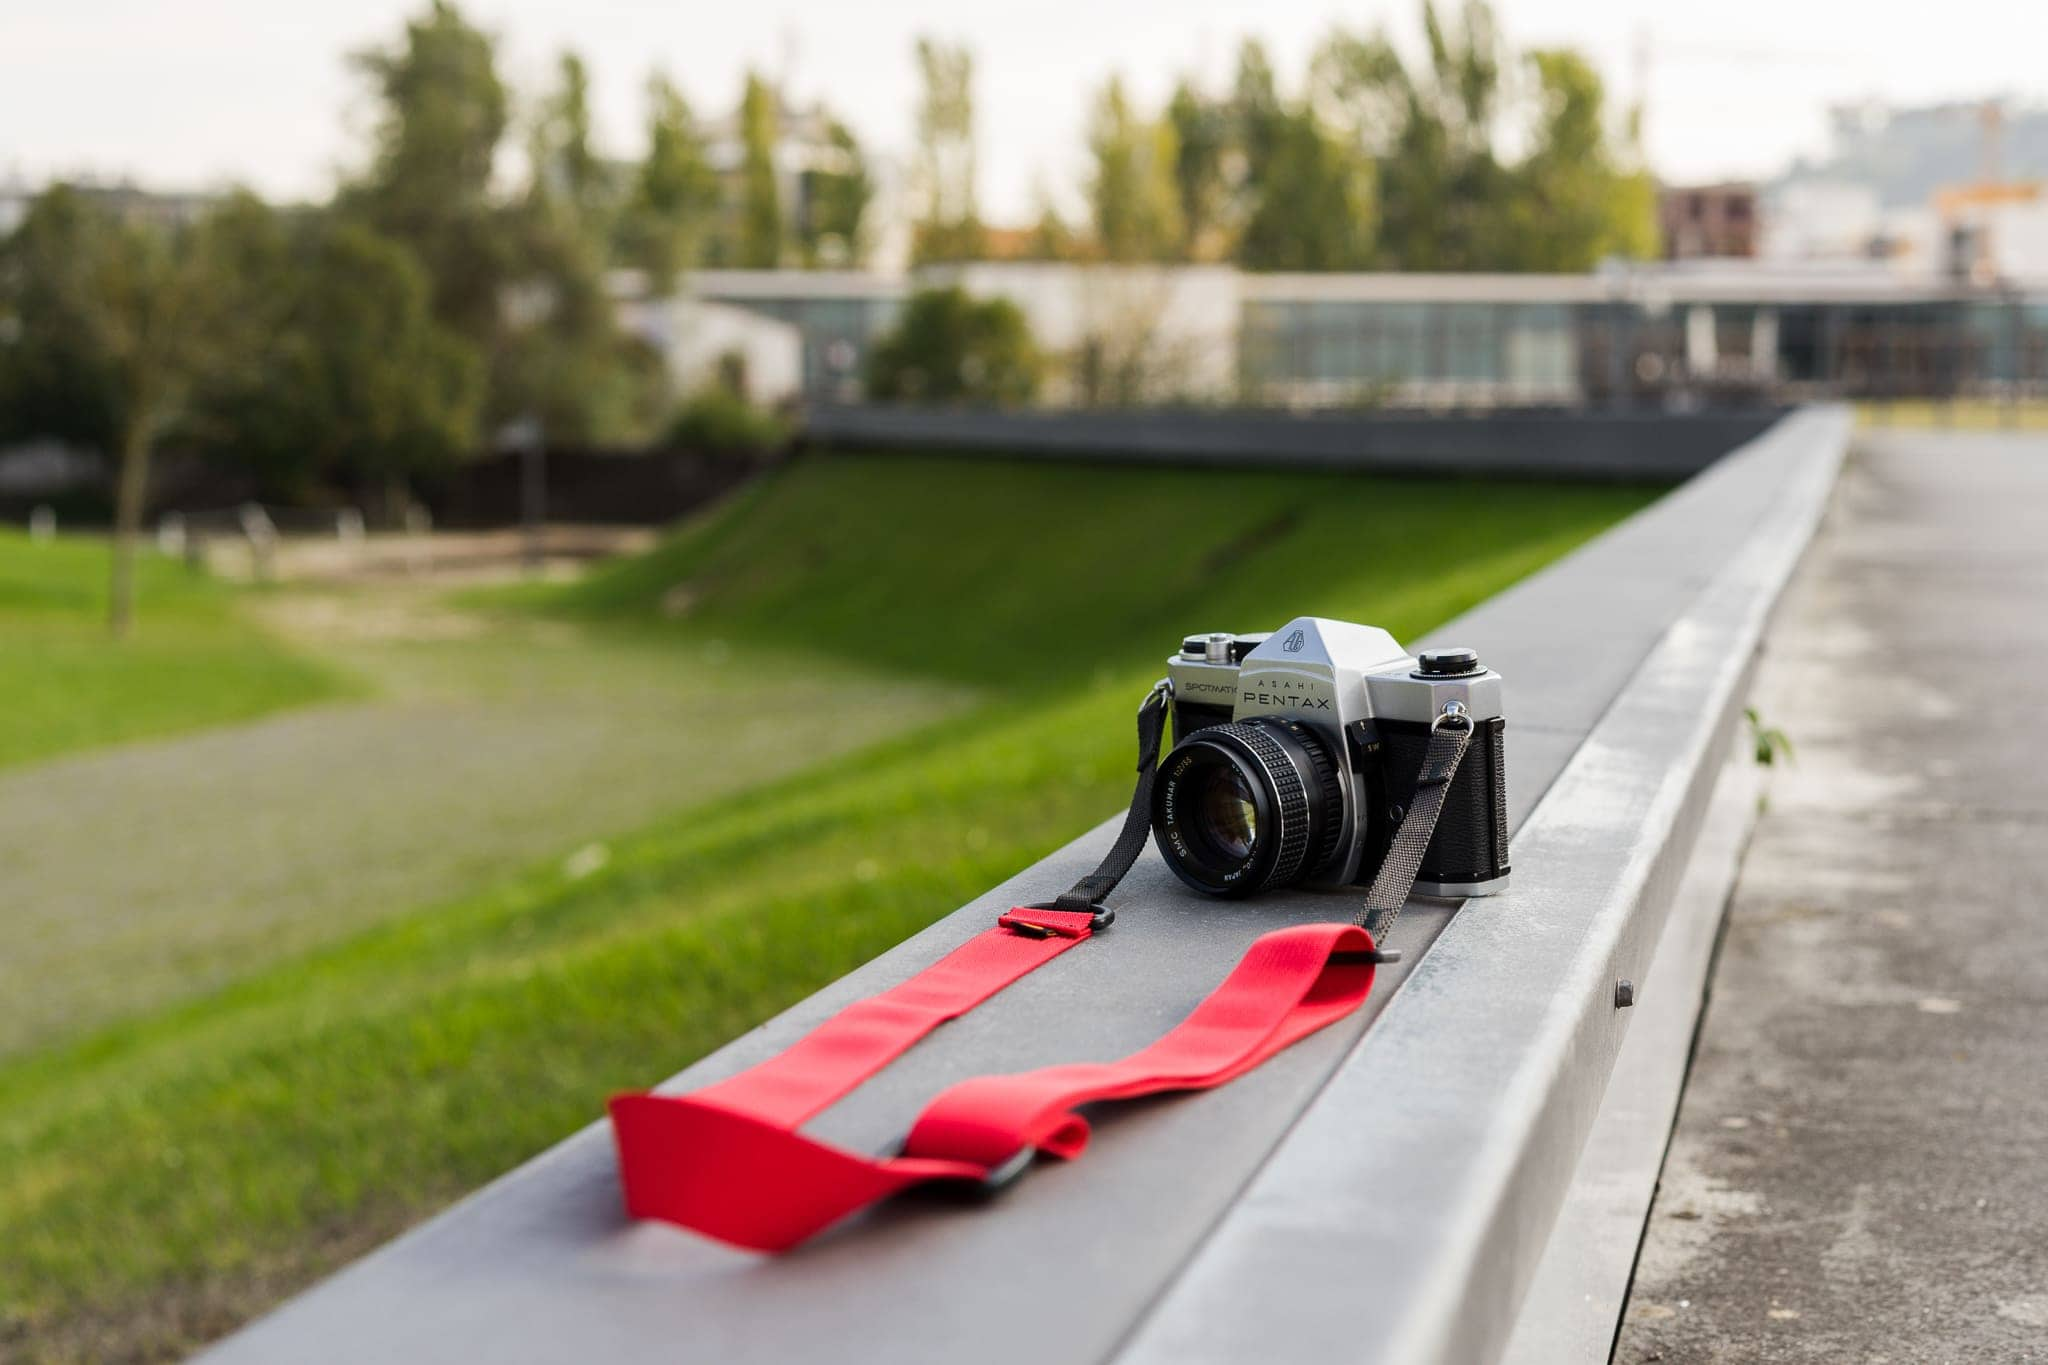 OlympusPassion.com Reviews the Simplr F1 Camera Strap